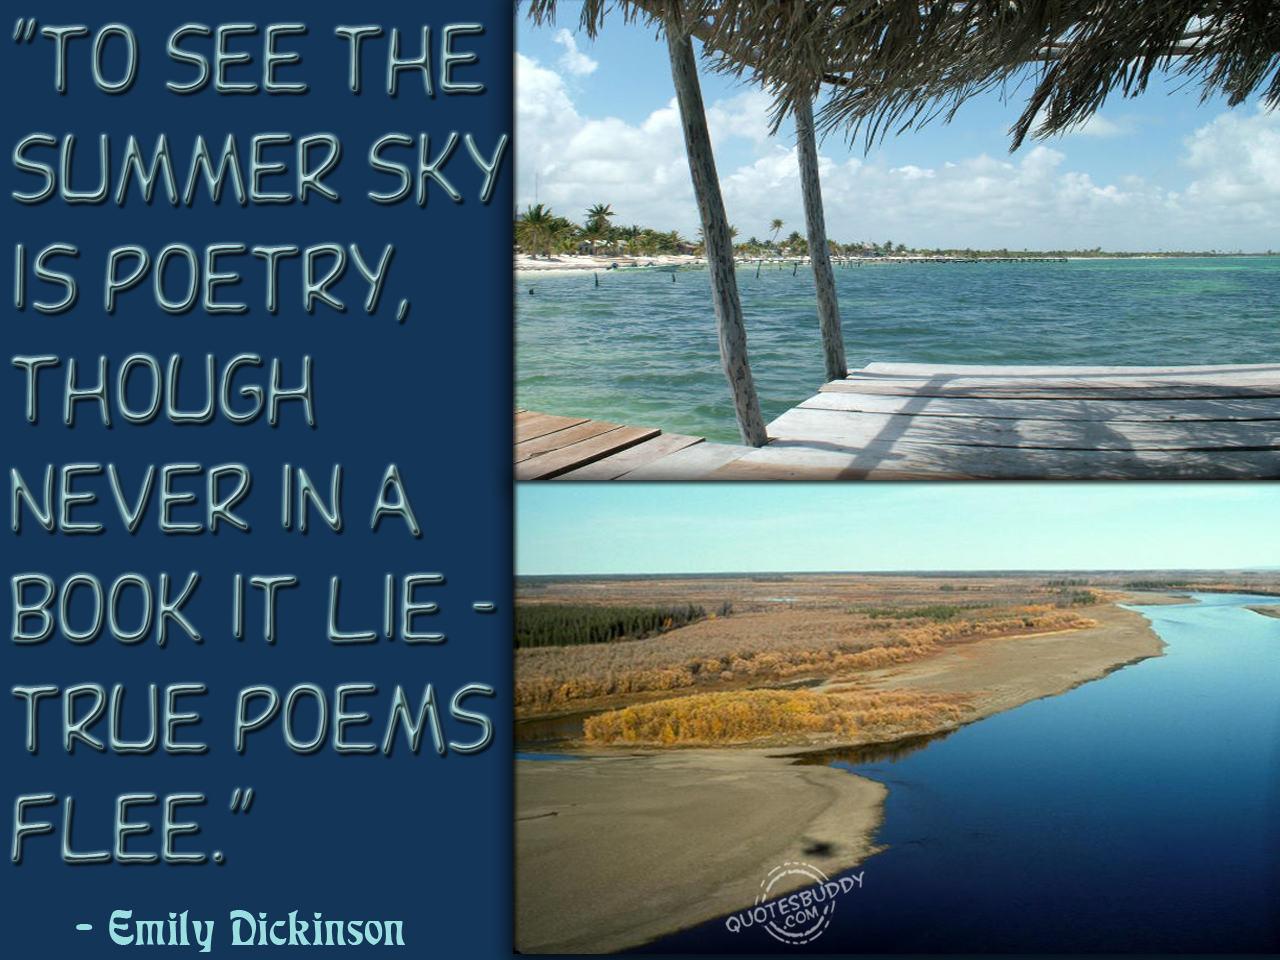 Bill Hood Hammond >> Summer Poetry Quotes. QuotesGram